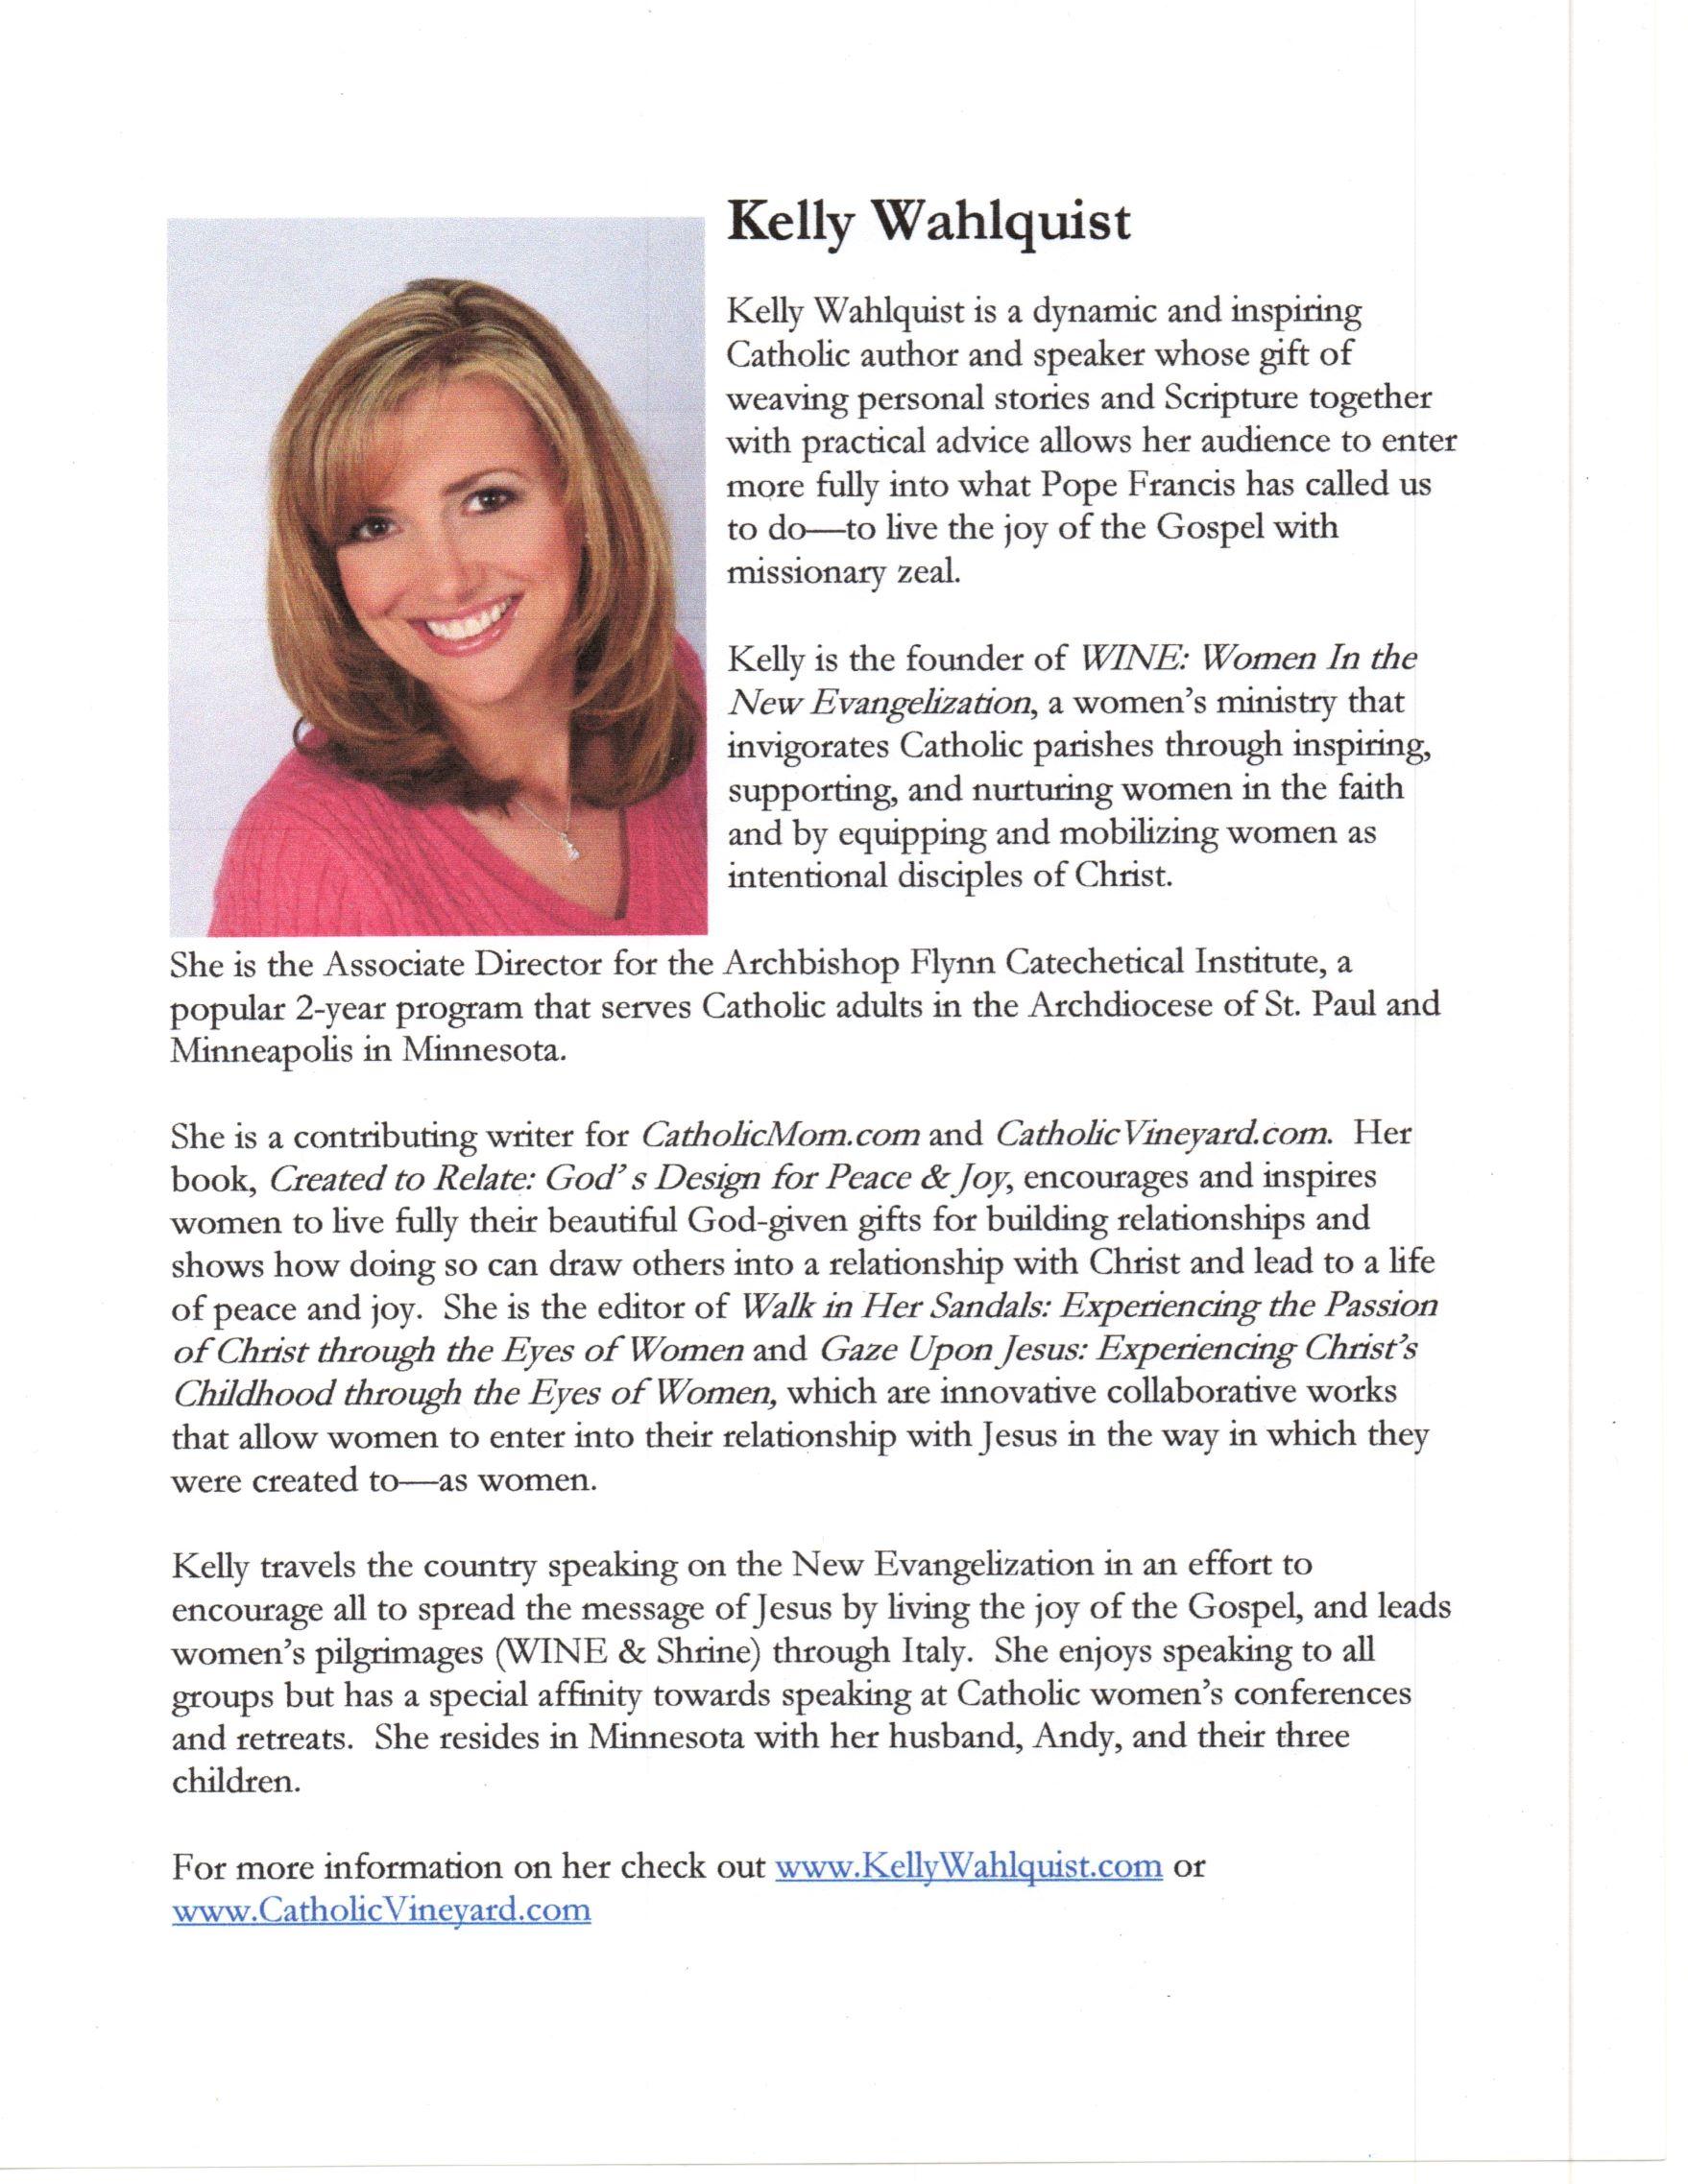 Kelly Wahlquist - Keynote Speaker